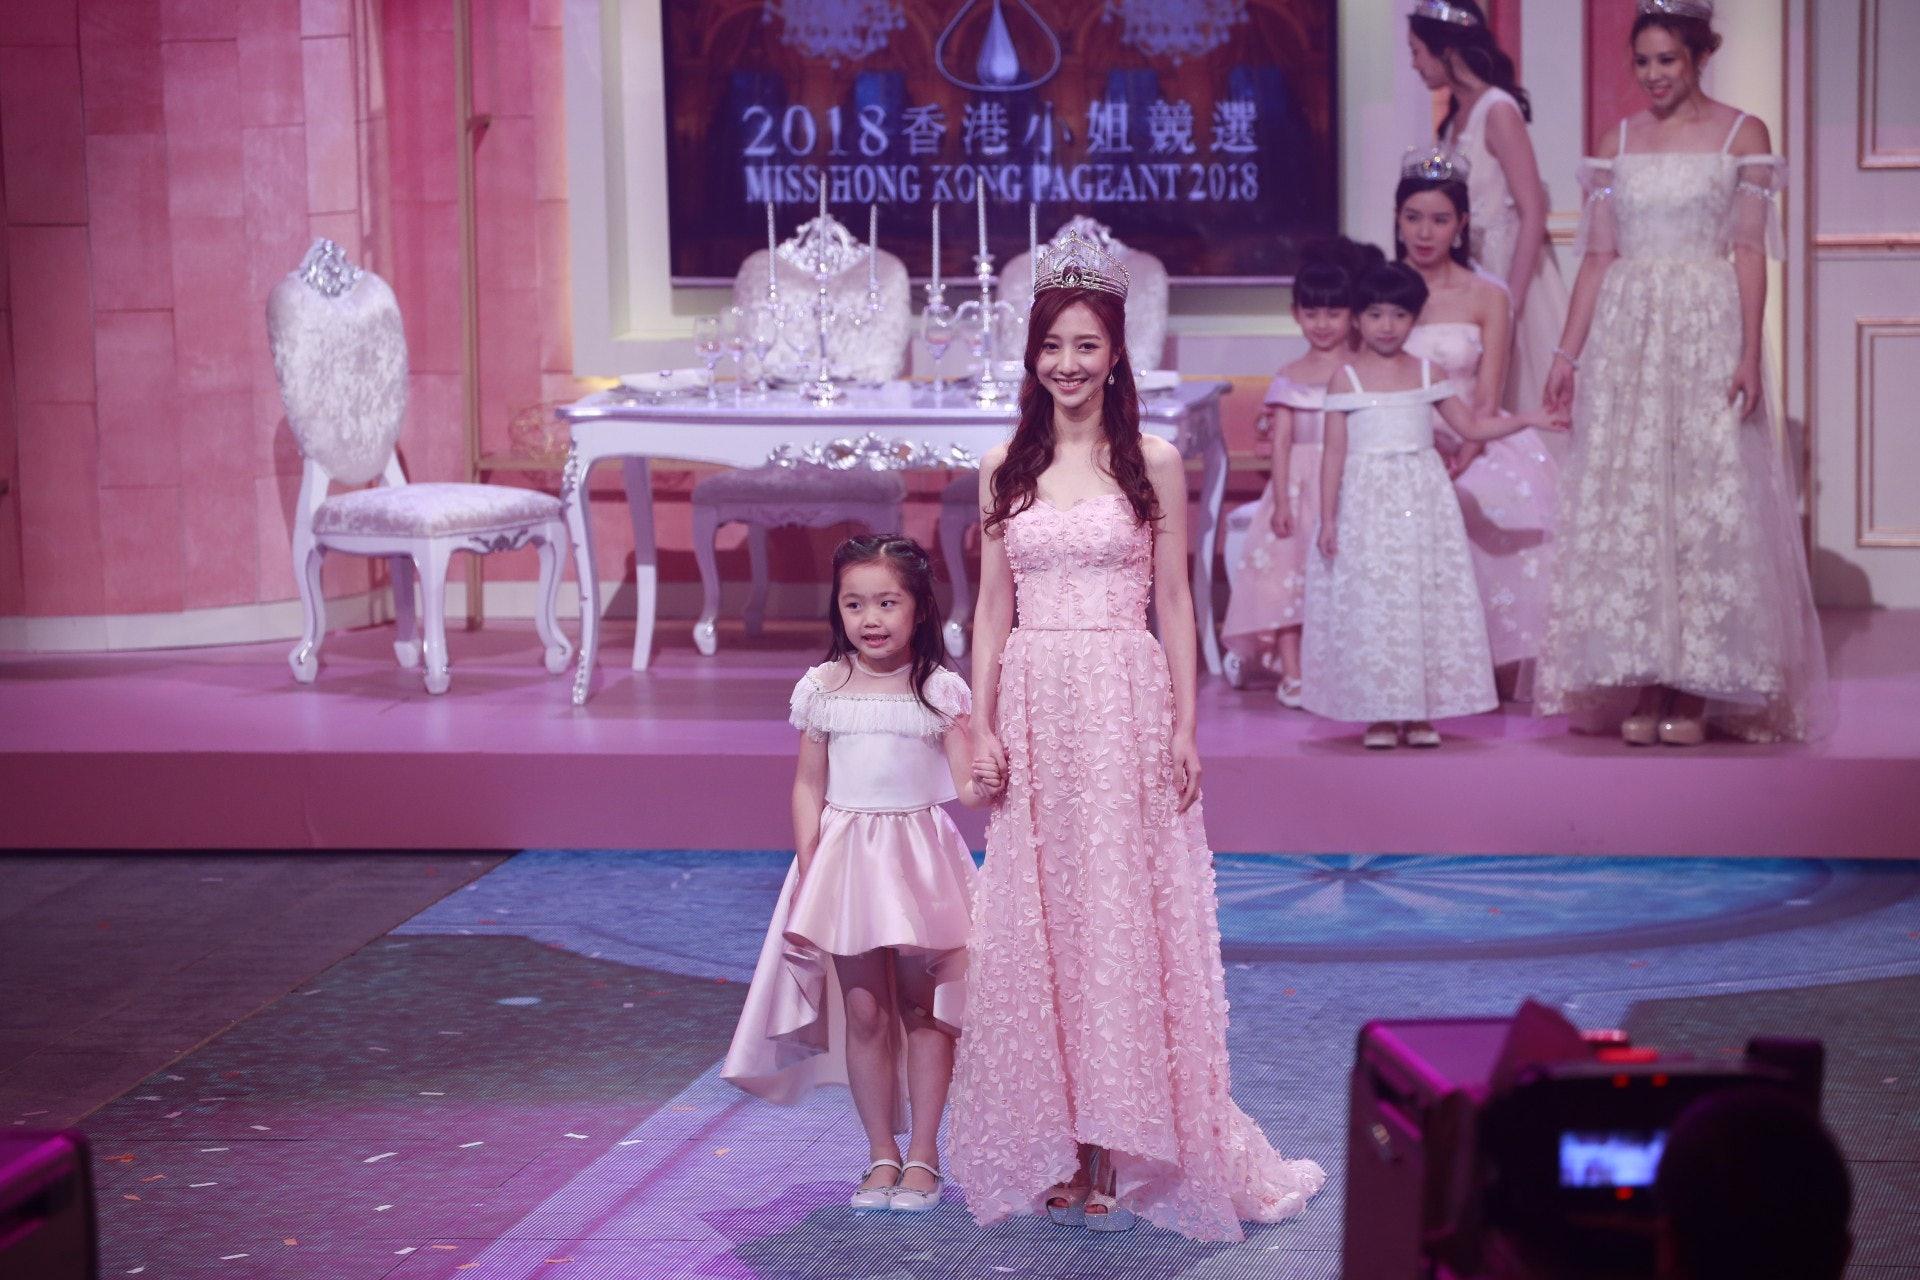 《big big channel大公司周年慶》其中一個環節,由何依婷做17年的港姐代表上台。(資料圖片)